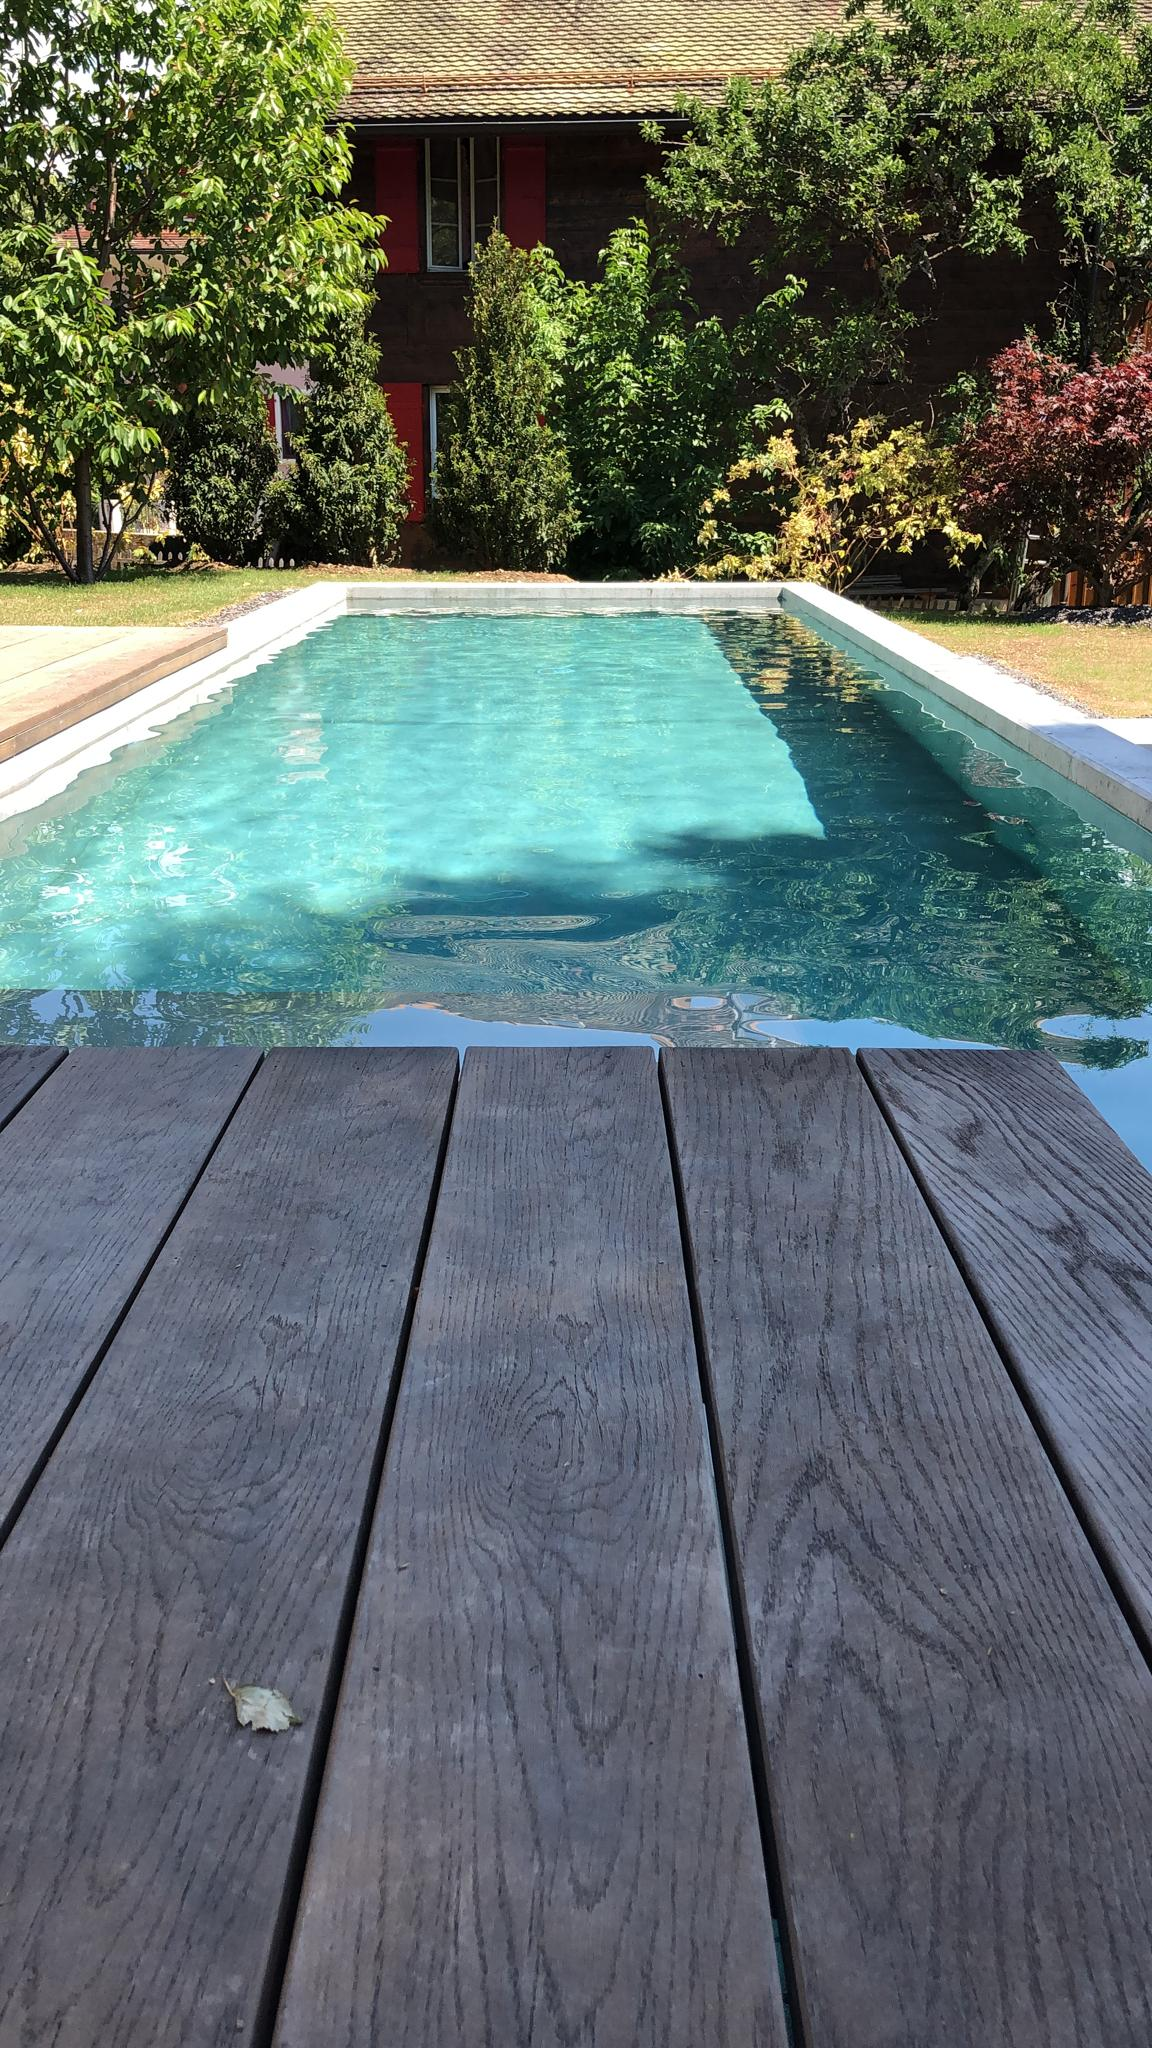 lauper-piscine29.jpeg